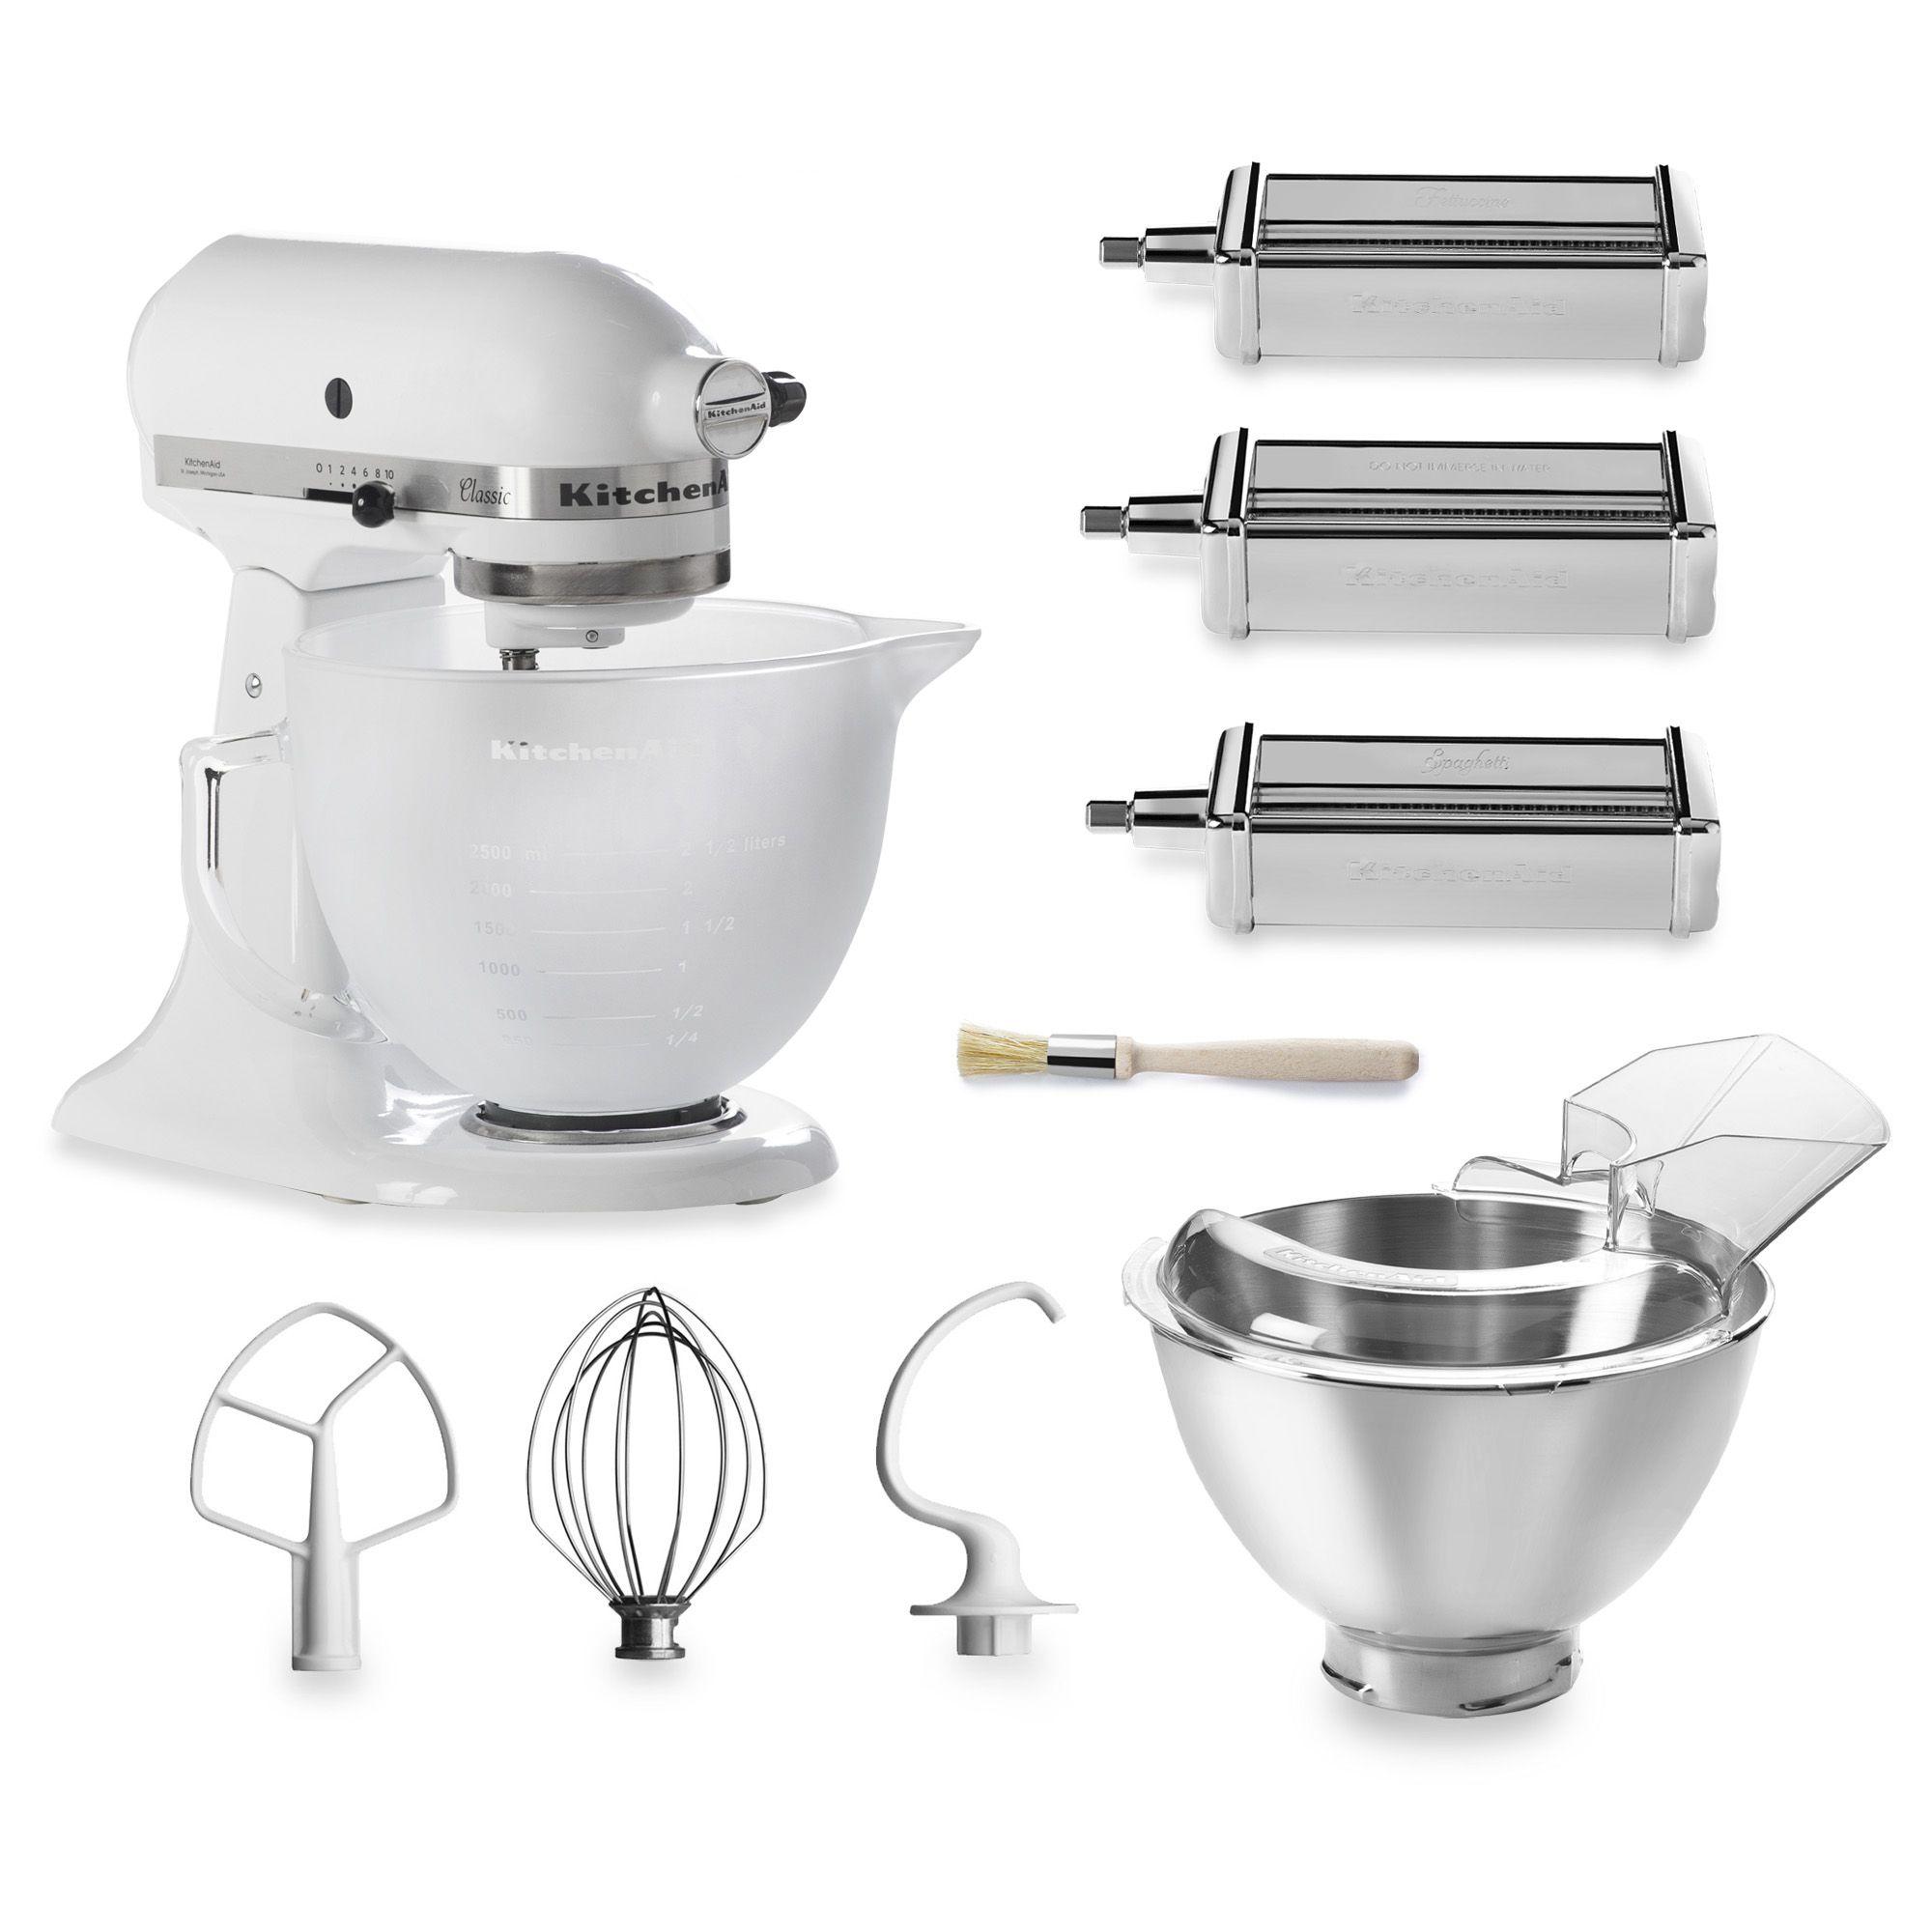 Kitchenaid cucina marchi qvc italia - Qvc marchi cucina ...